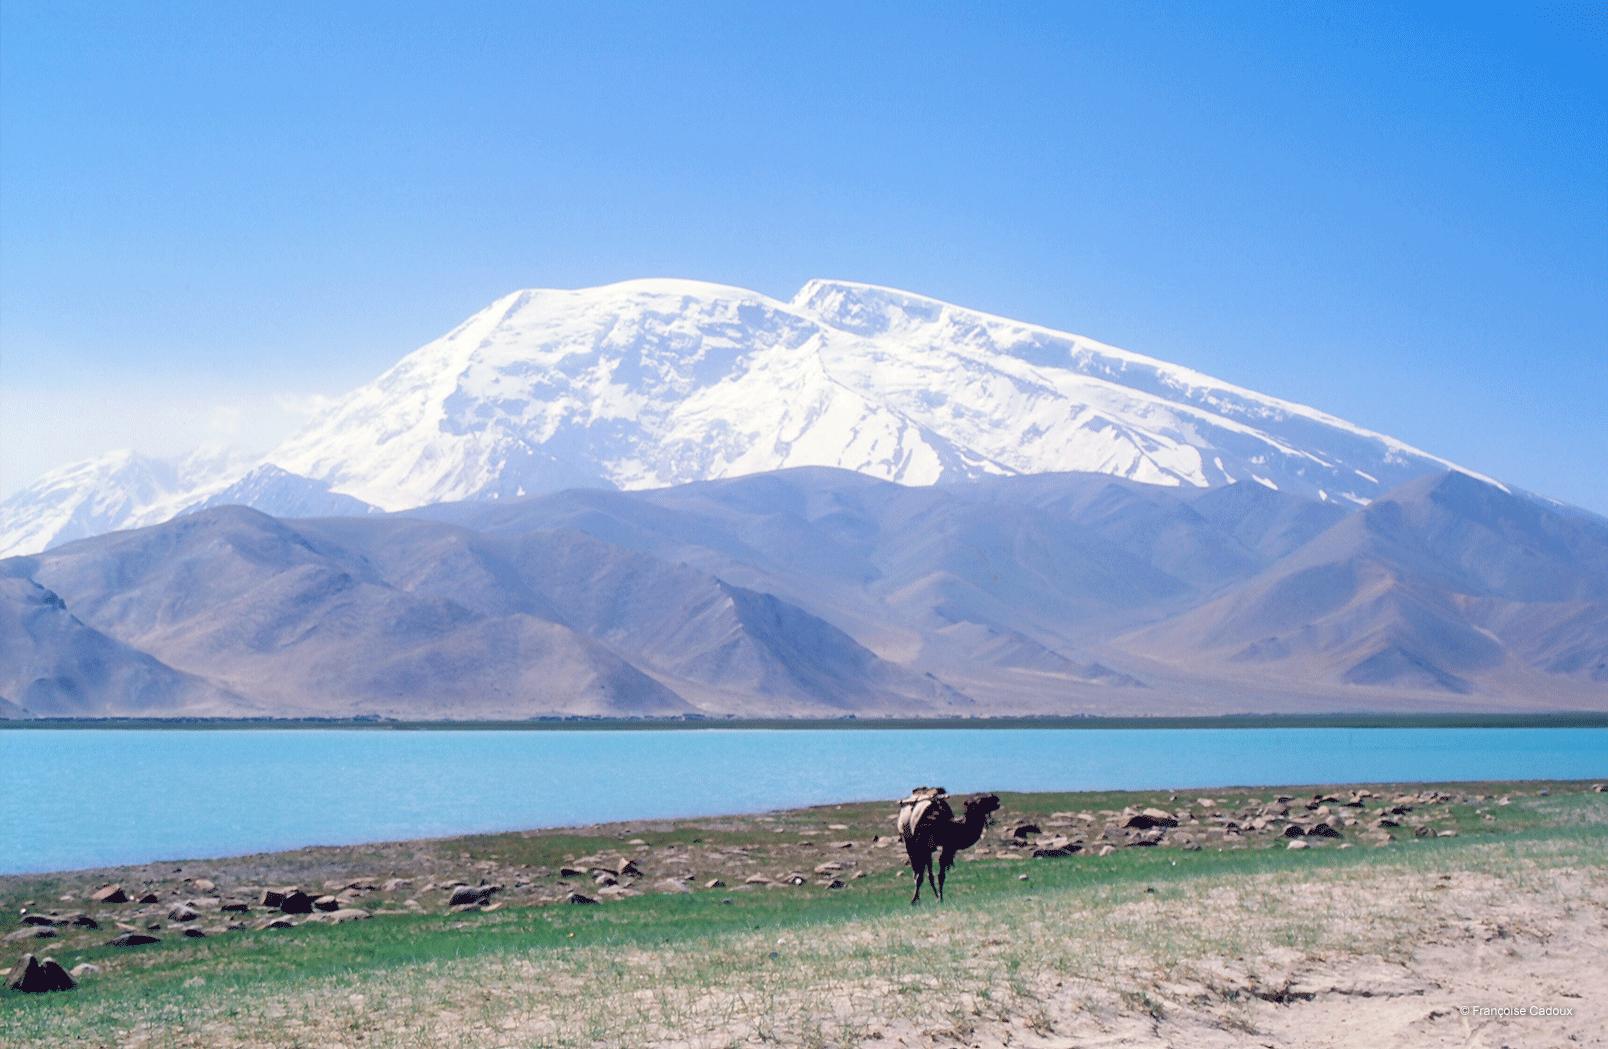 Le Muztagh Ata, vu du lac Karakol